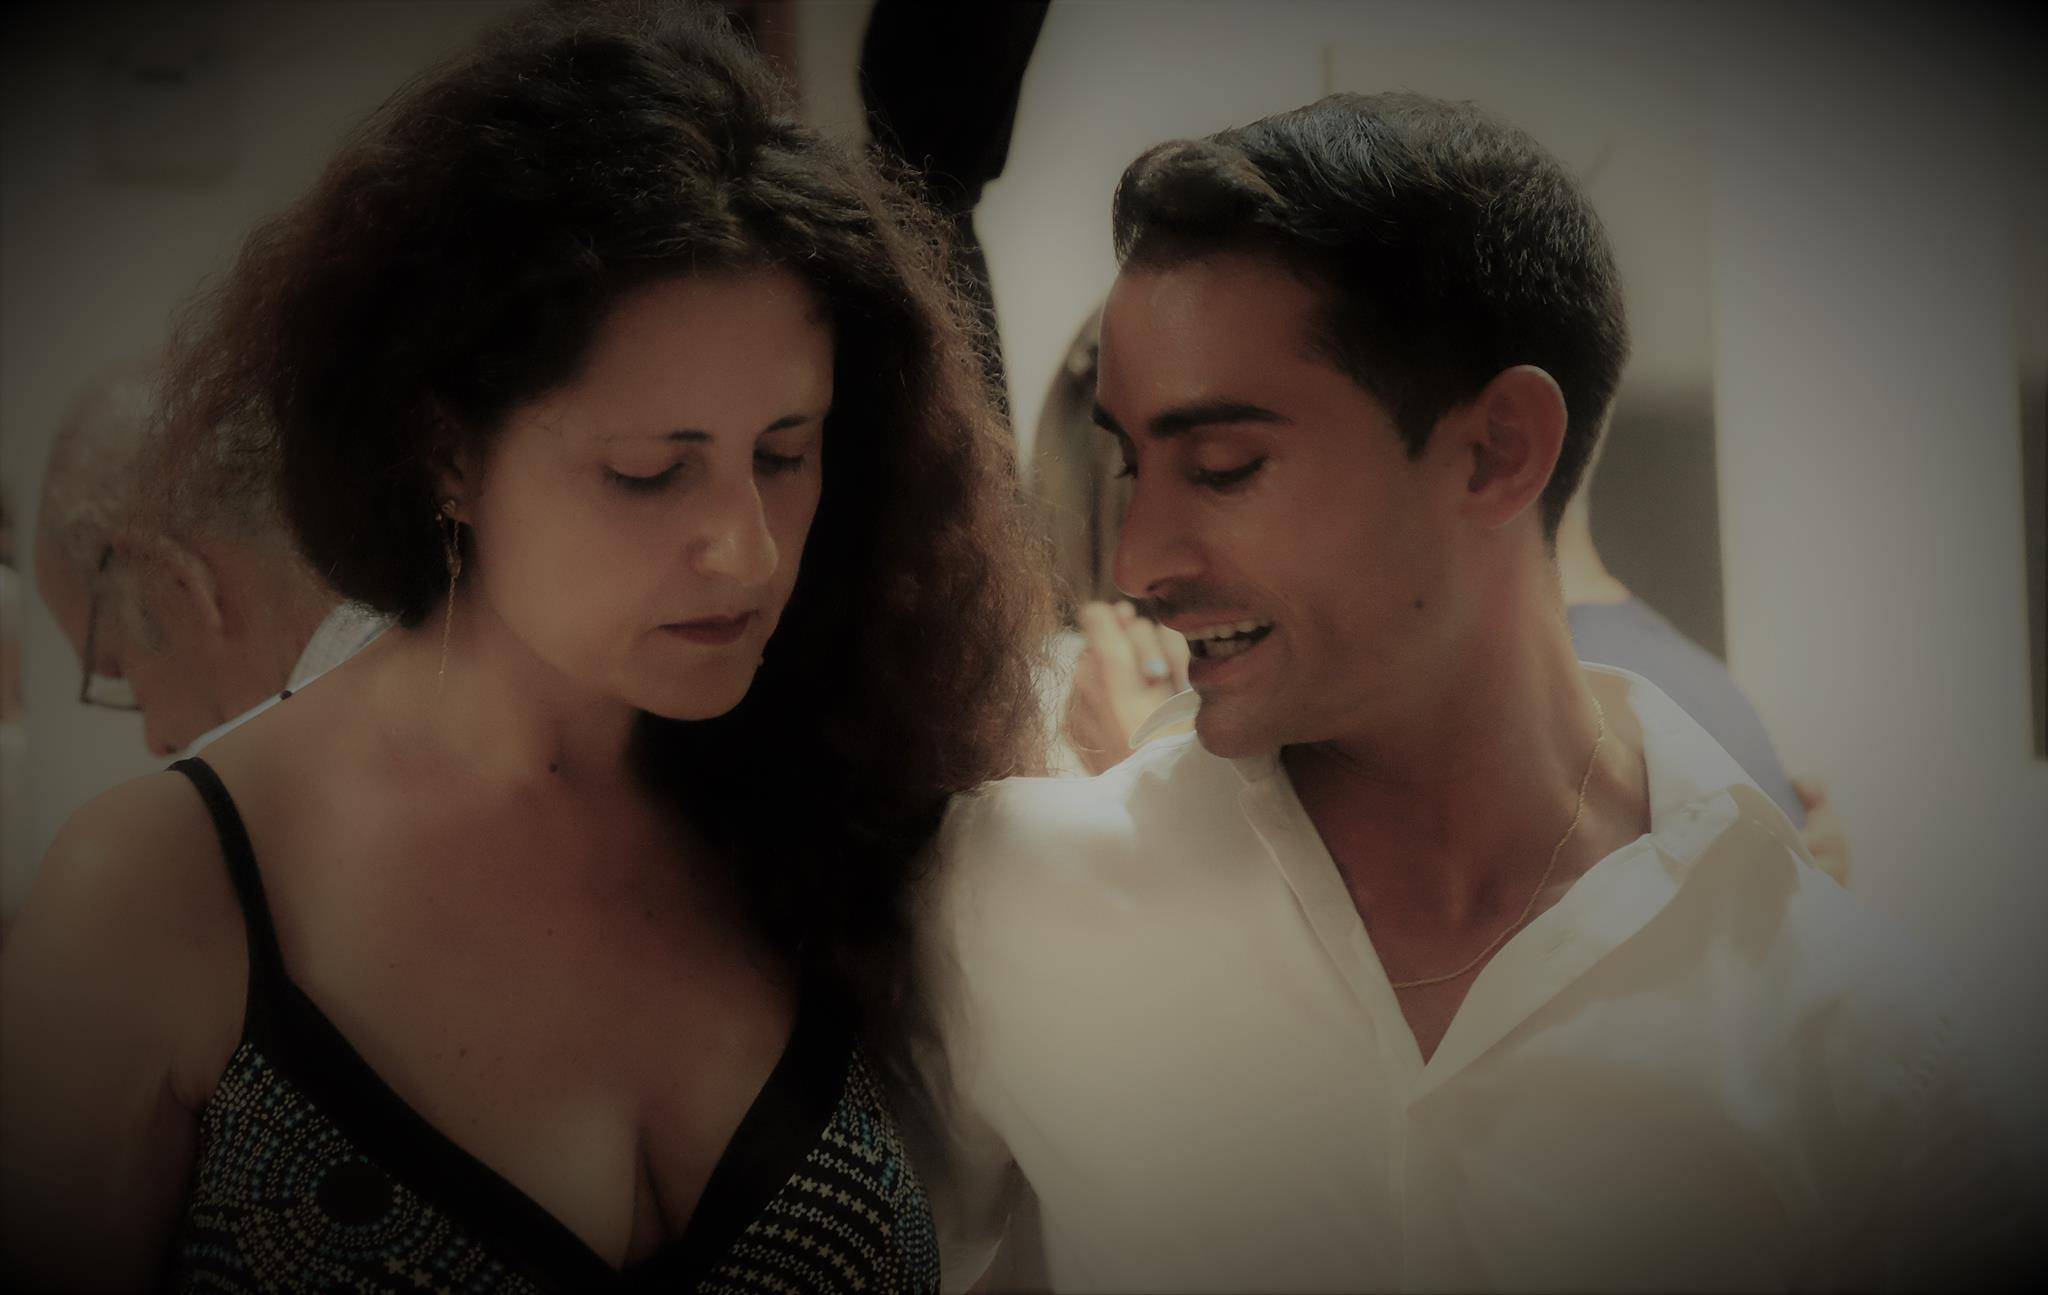 Zuleika Fusco e Joaquin Torres - Avalon Progetto Tango Pescara